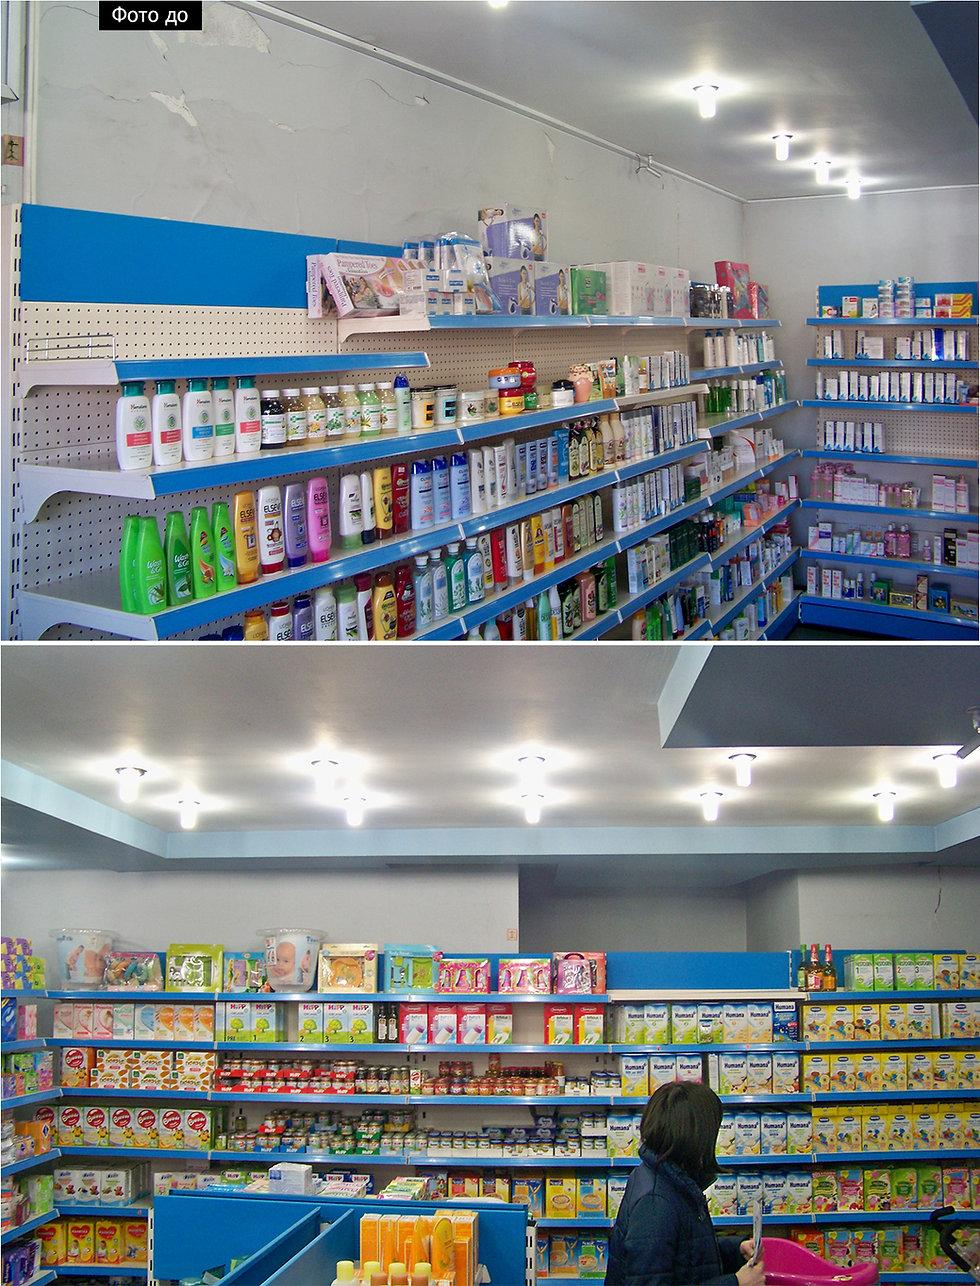 gpc pharmacu planning